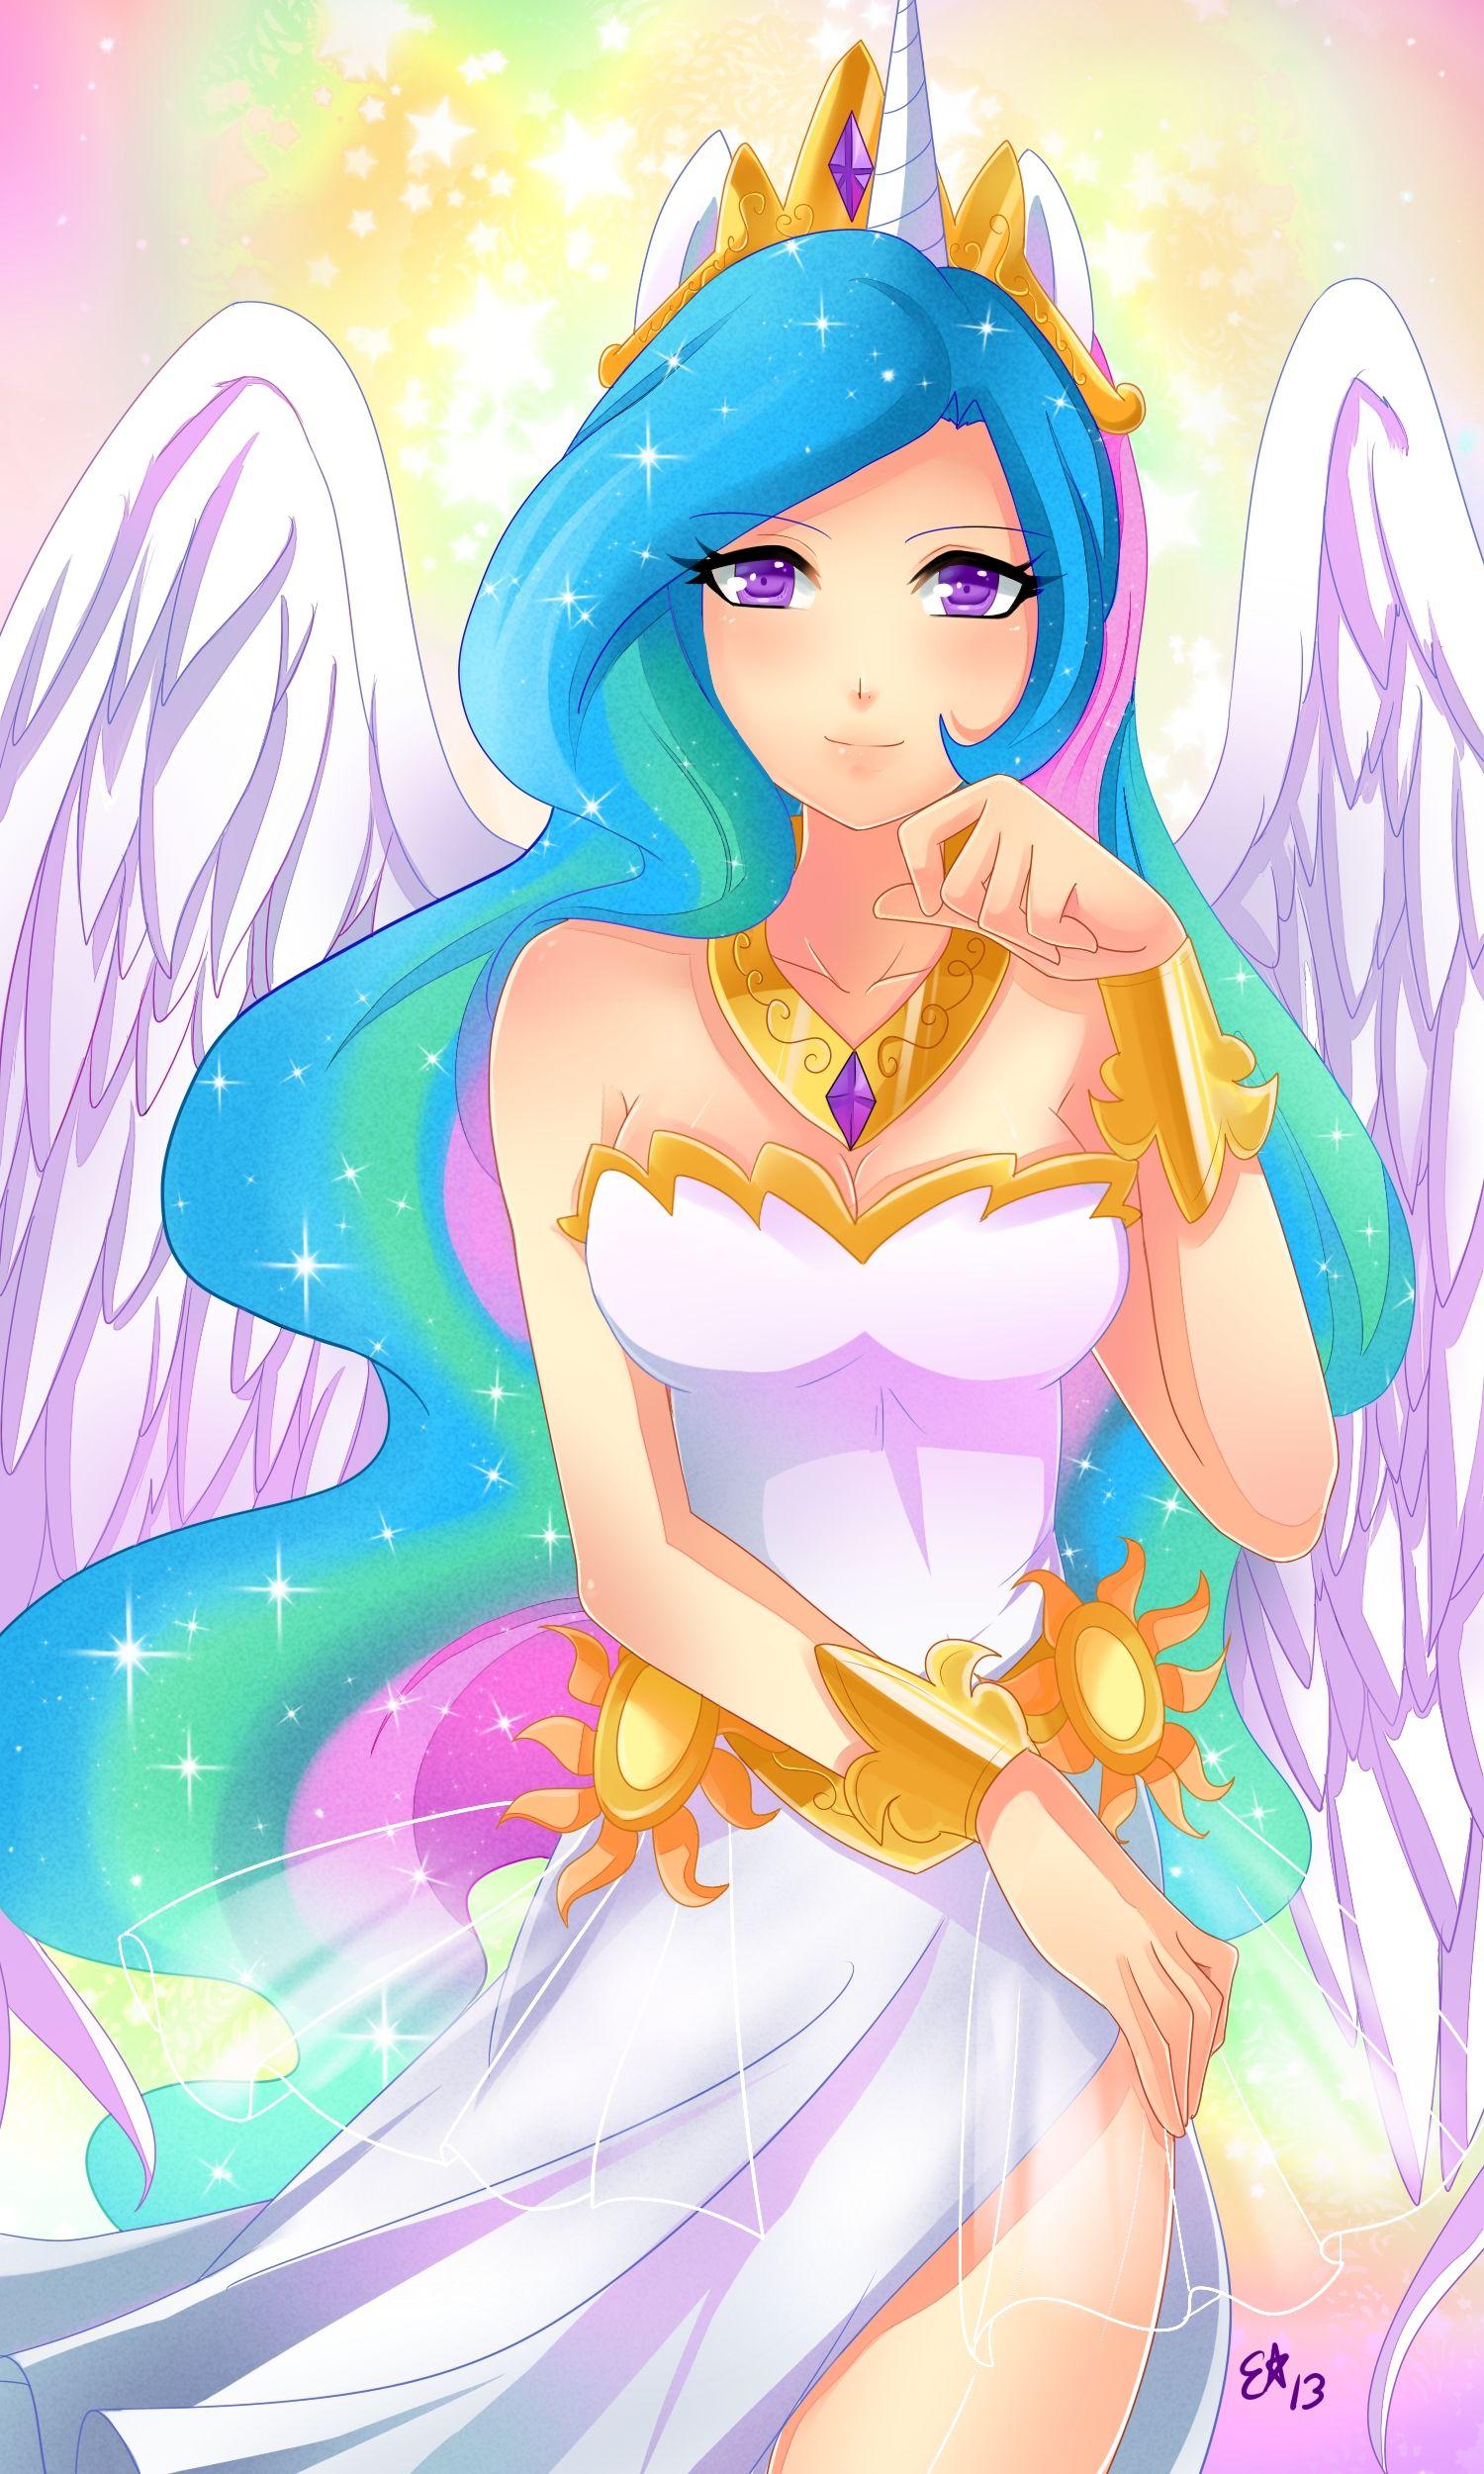 Princess Celestia | mlp usefully to me | Pinterest ... Celestia Mlp Human